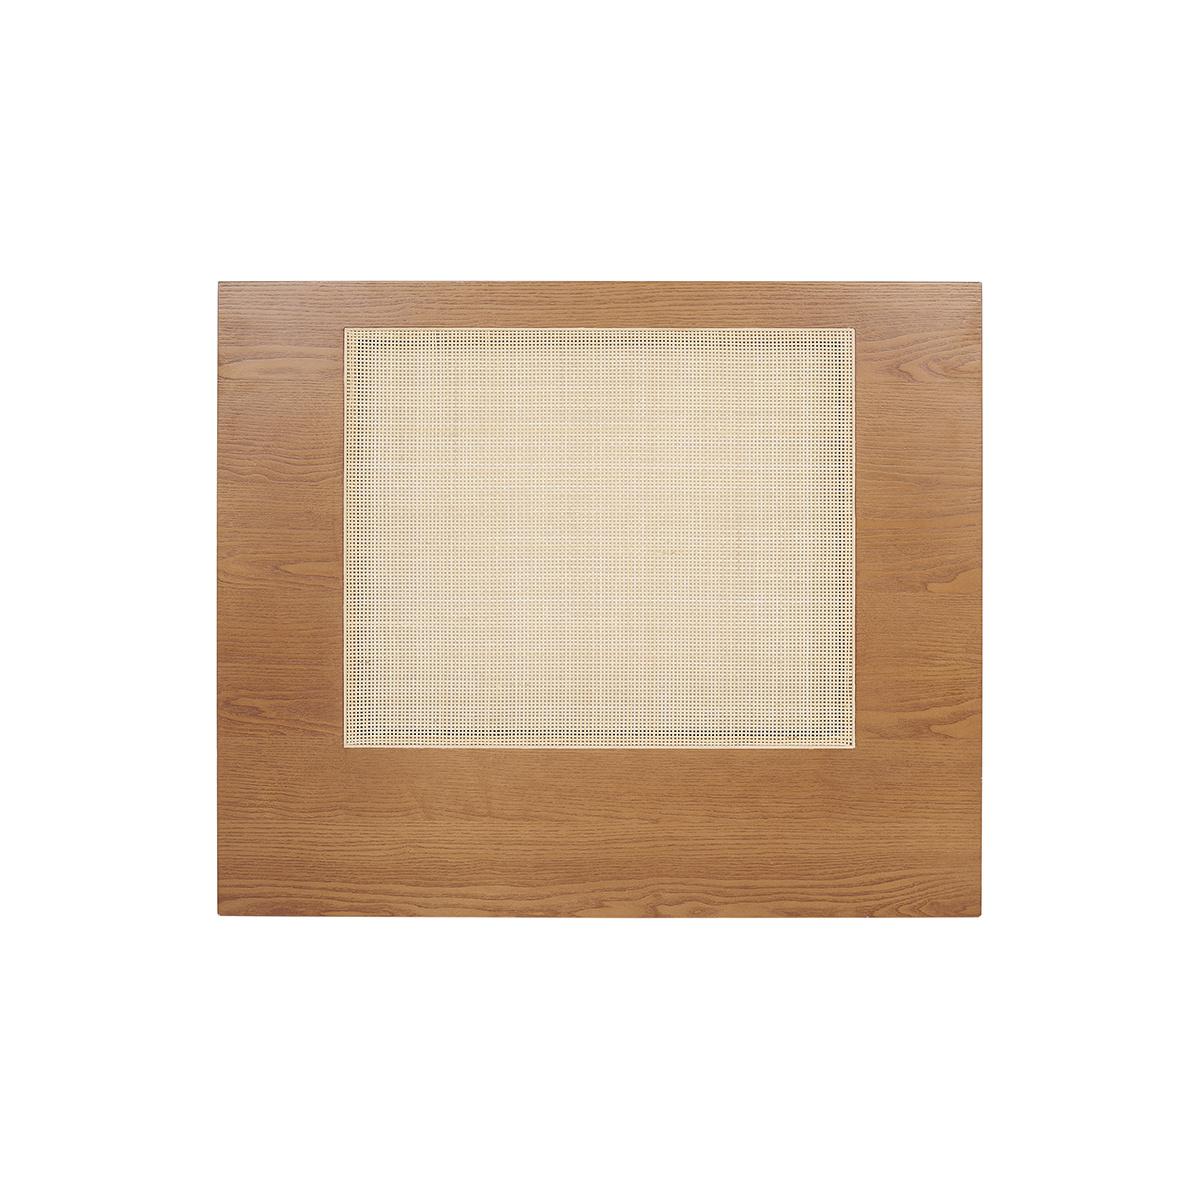 Single Bed Headboard Sogno, Cherrywood Finish